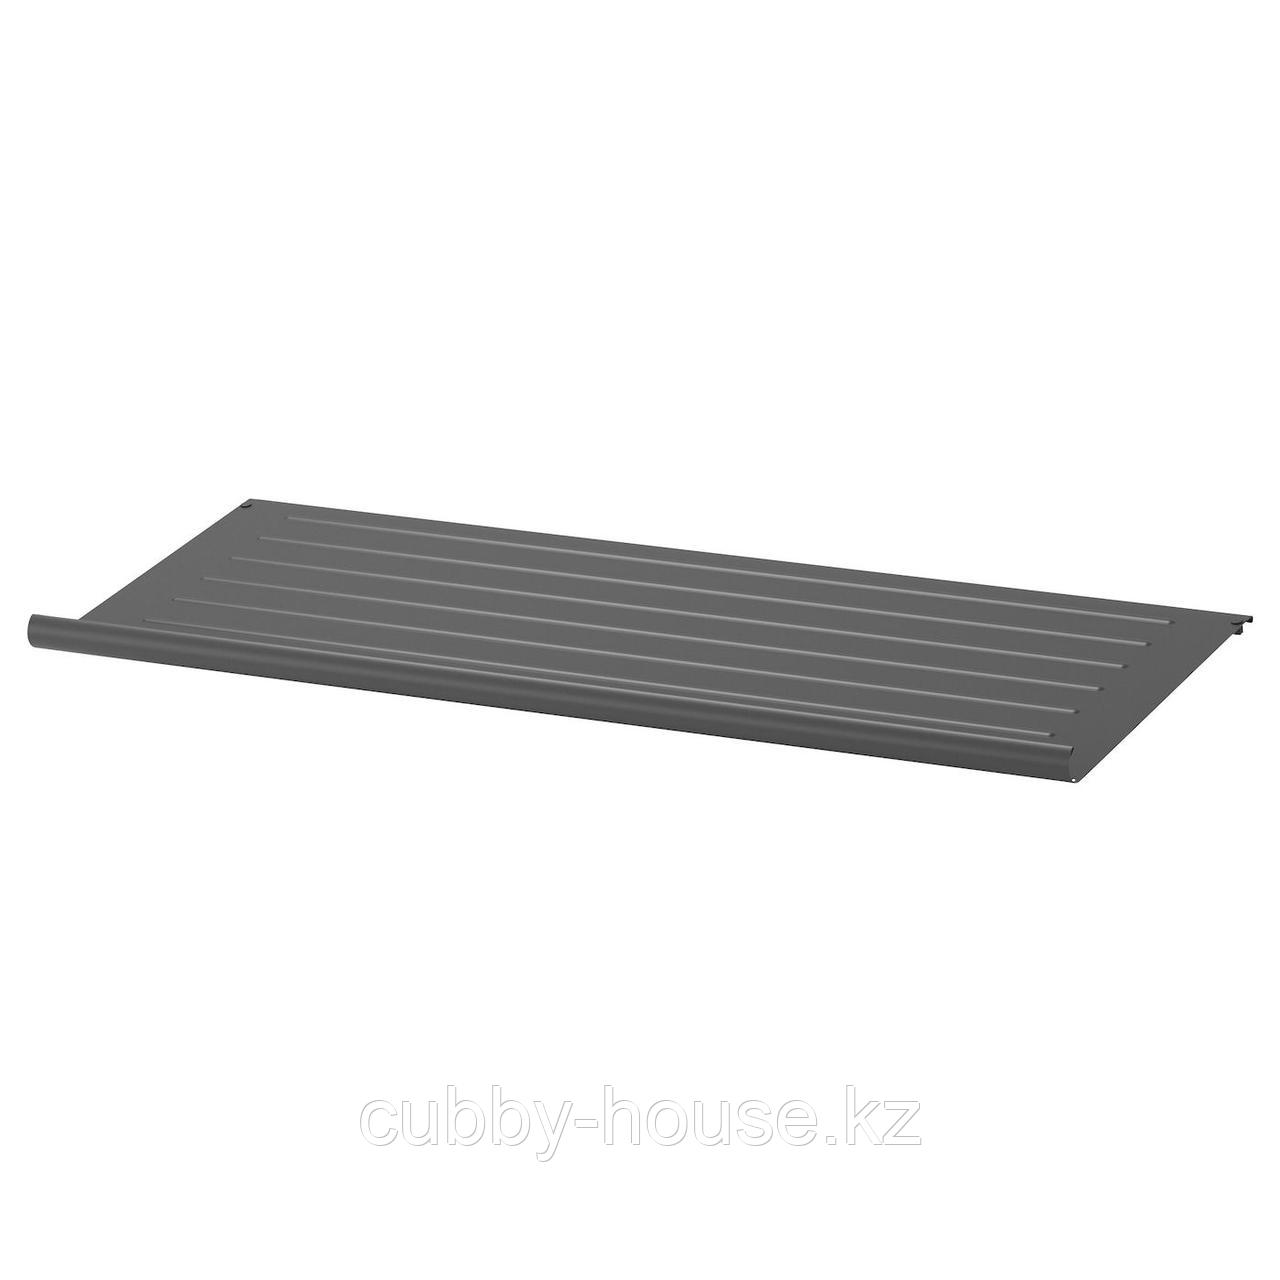 КОМПЛИМЕНТ Полка для обуви, темно-серый, 100x35 см